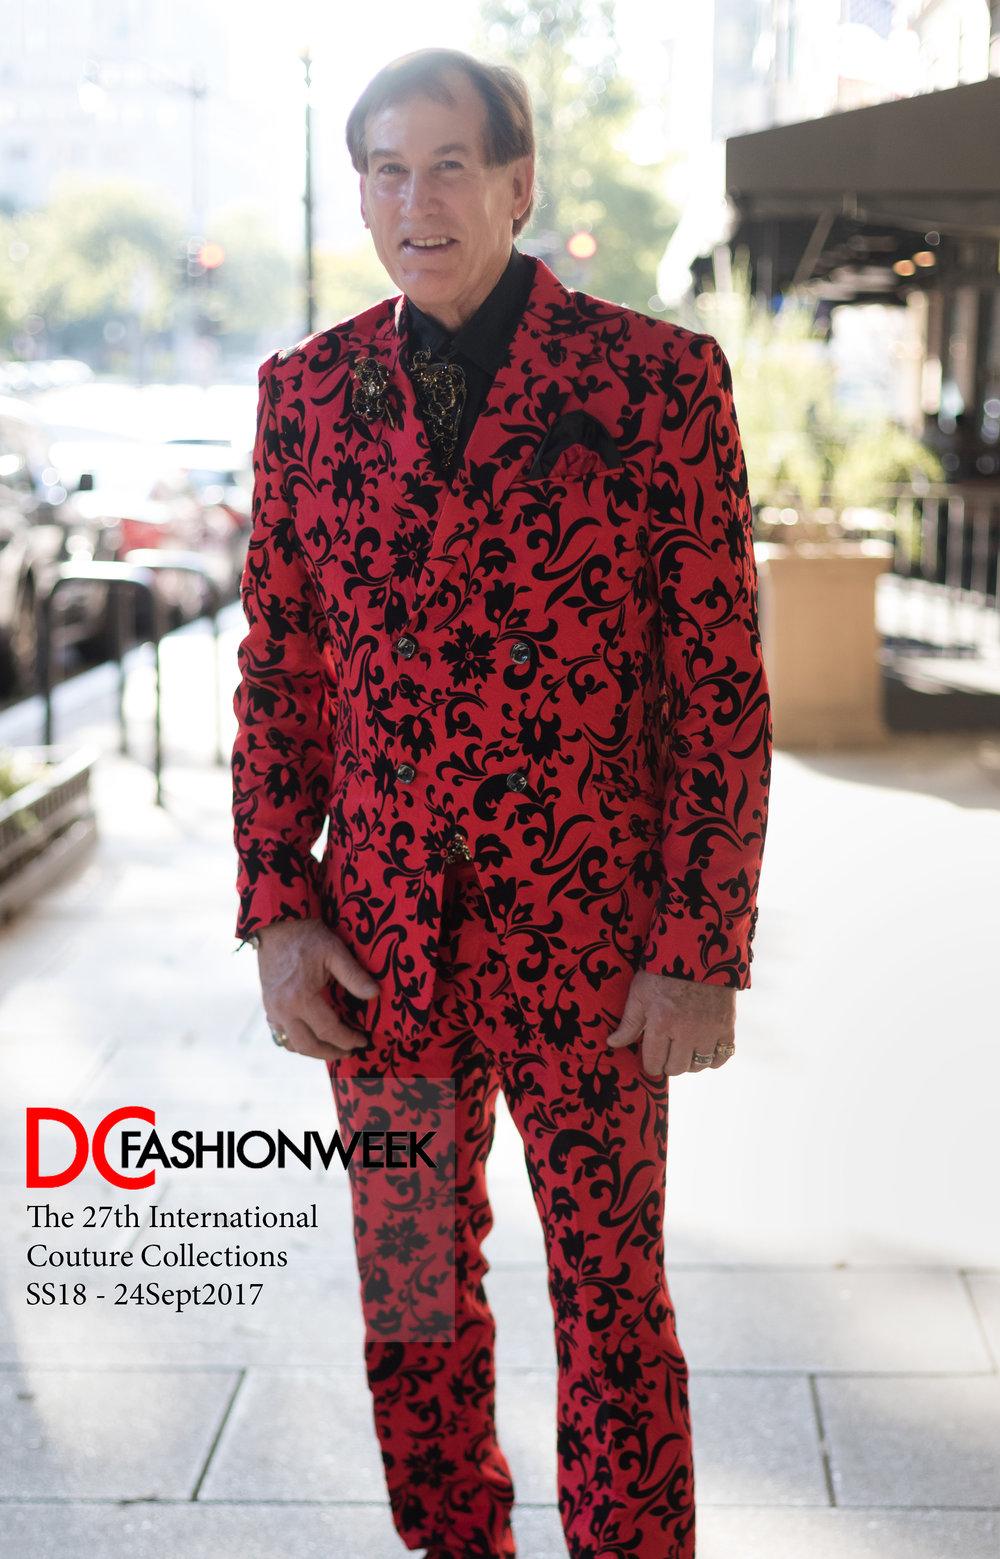 dc_fashion_week_AO9I8721.jpg